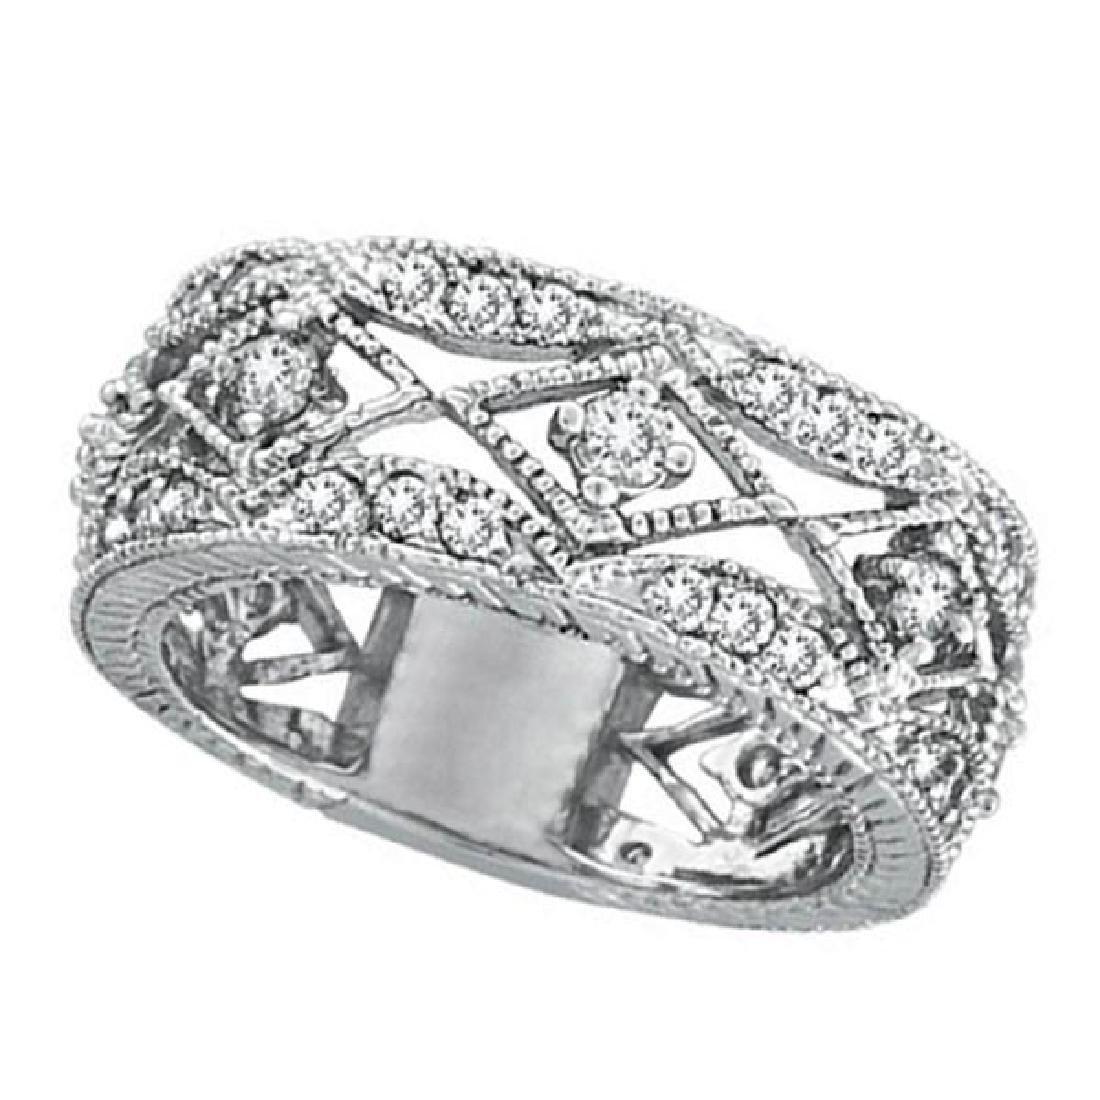 Antique Style Diamond Ring Filigree Band in 14k White G